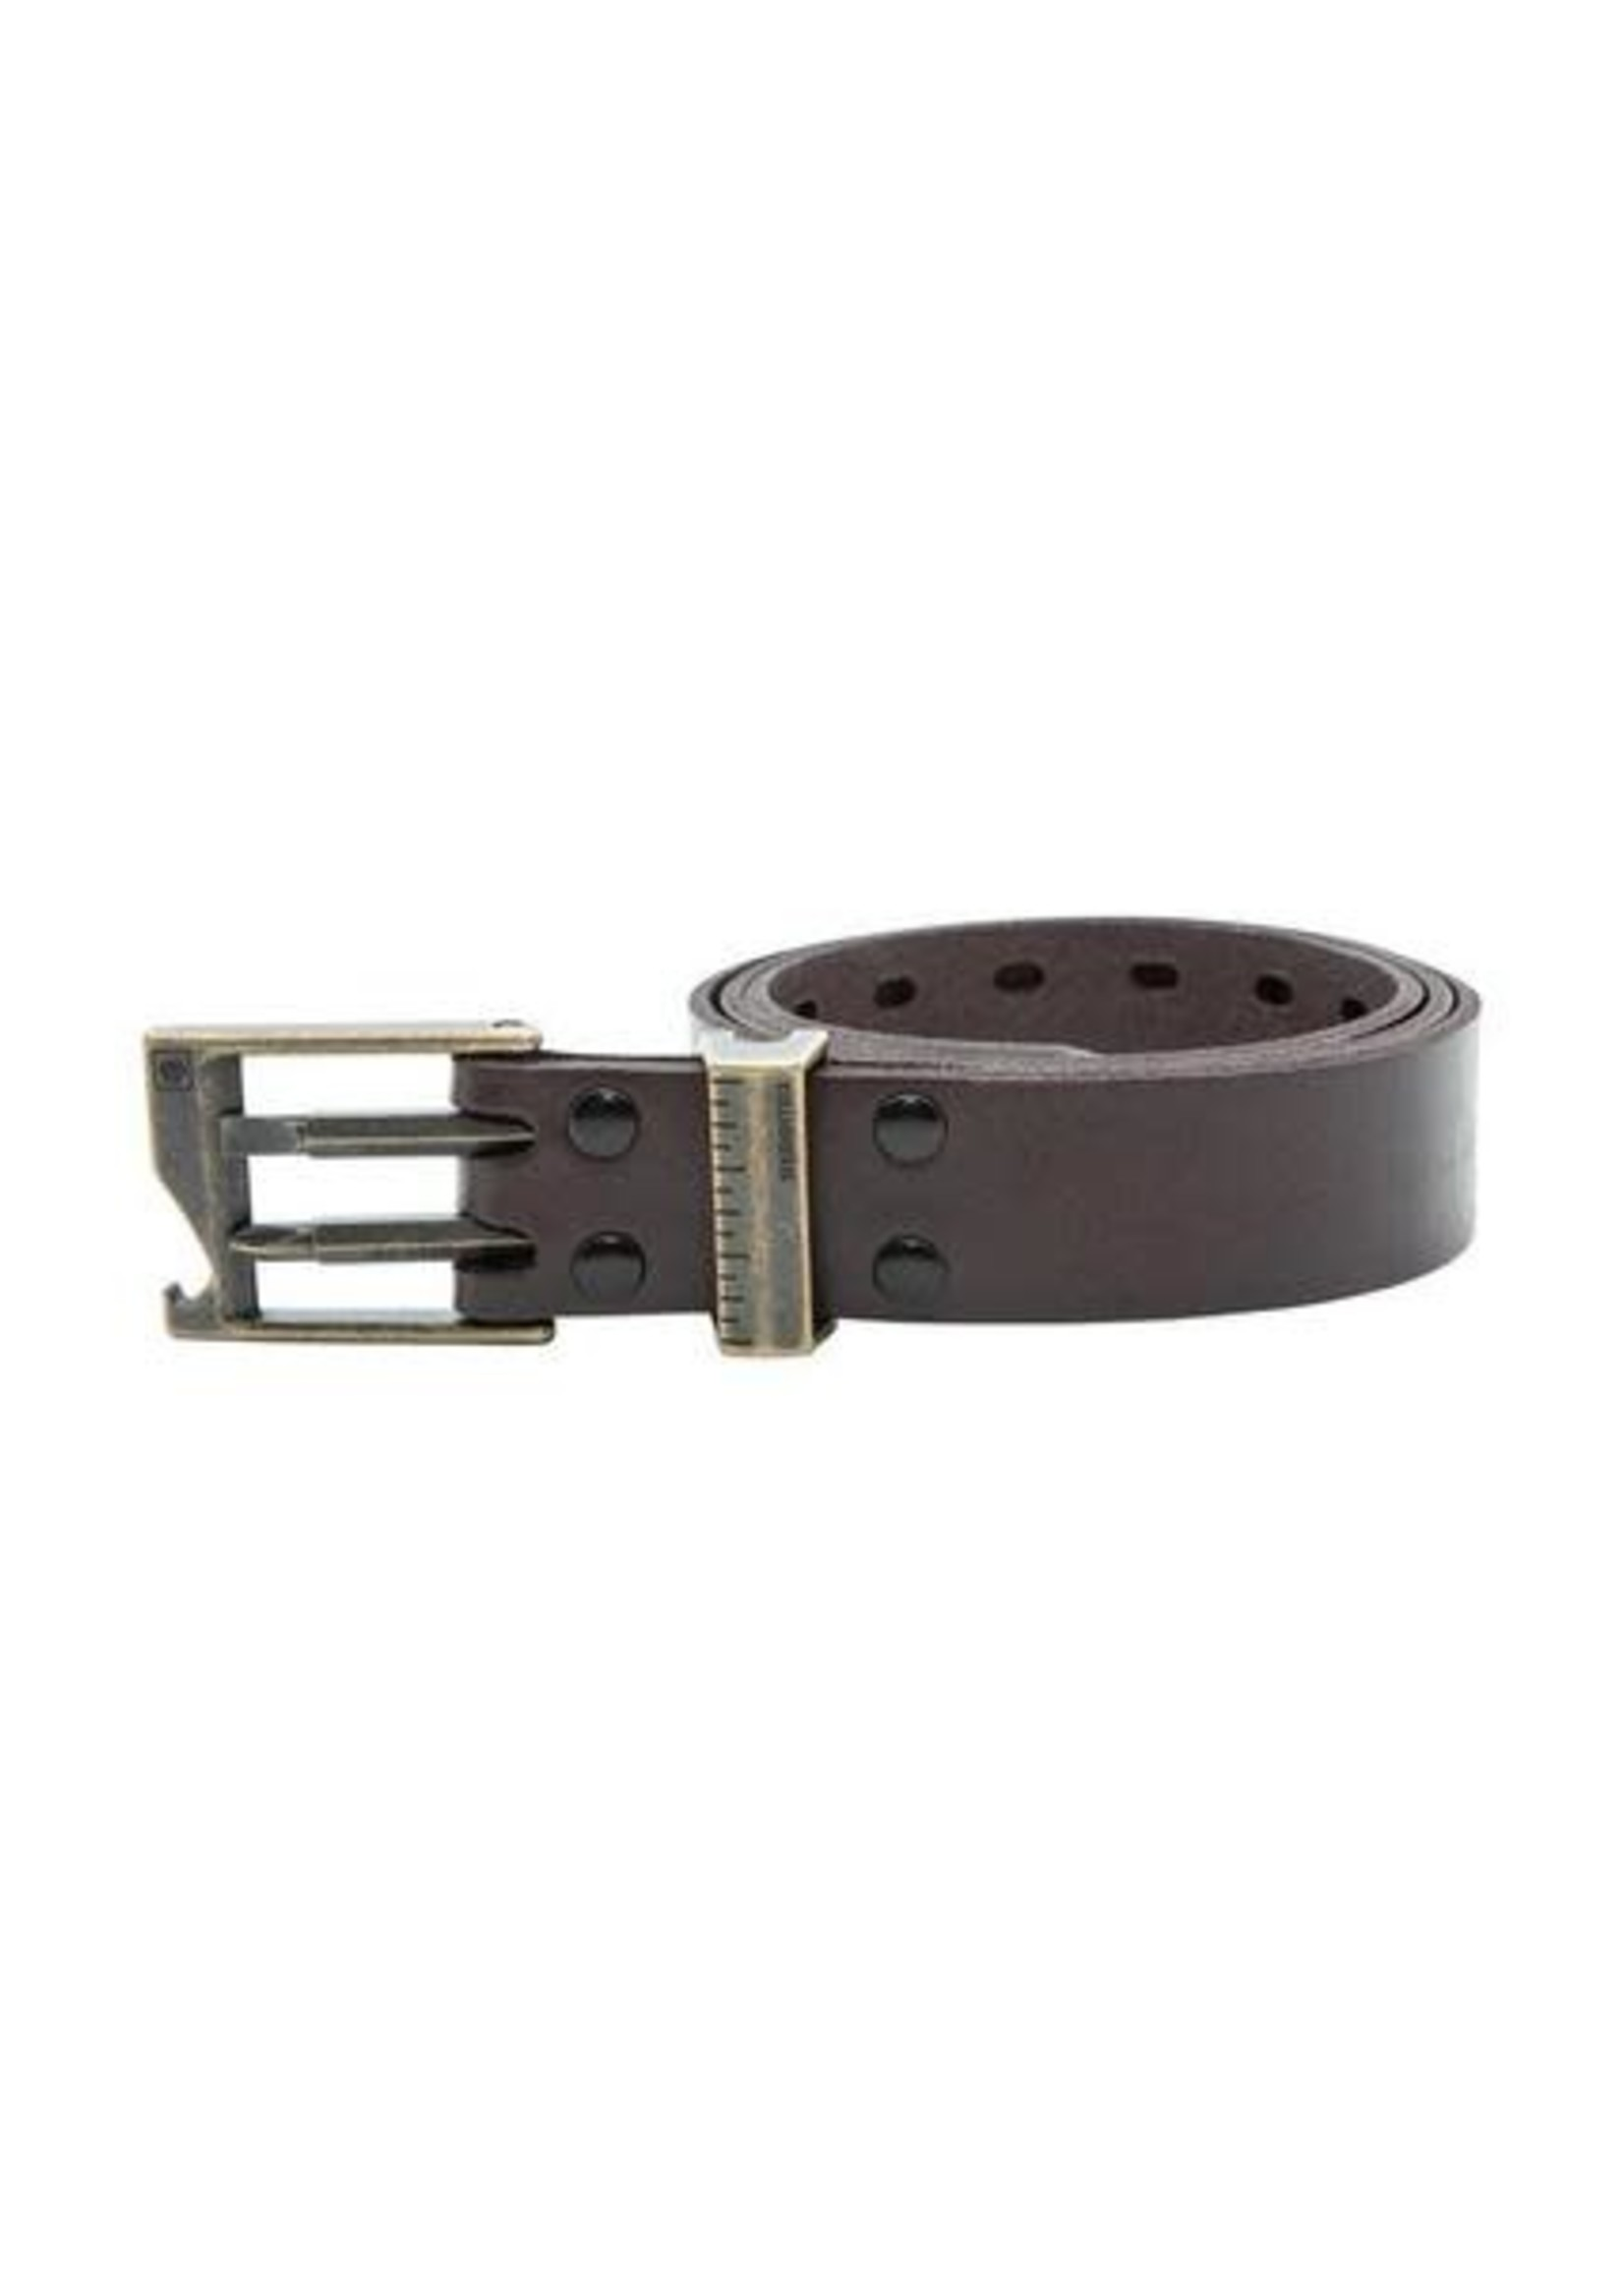 686 686 original tool belt